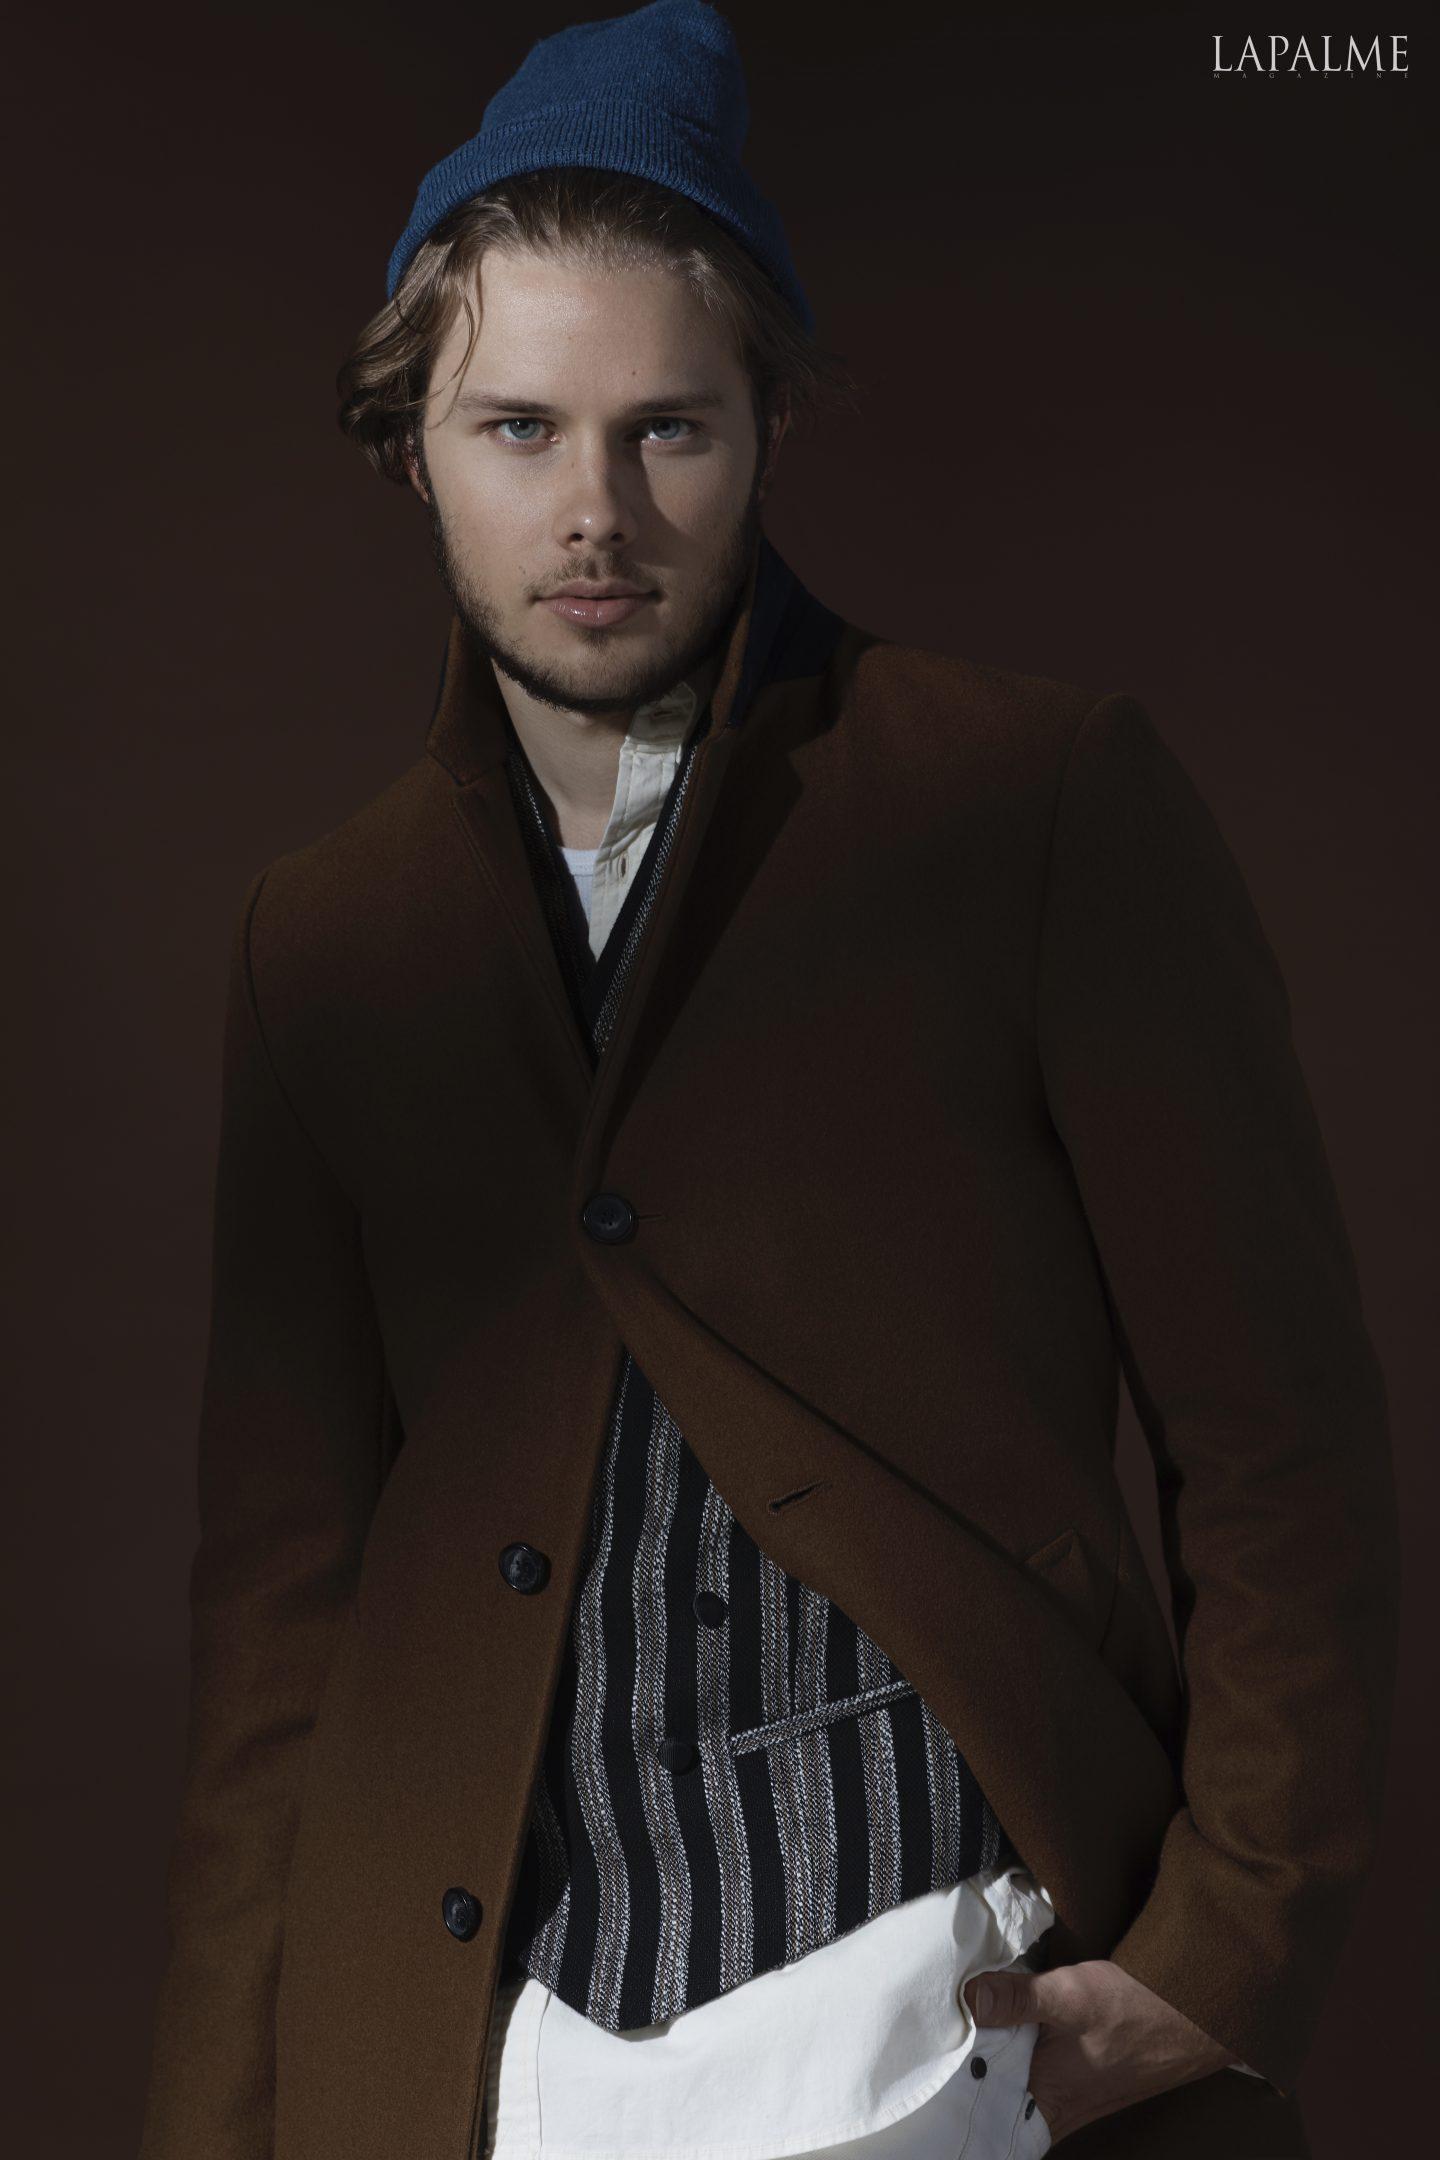 Beanie: H&M Shirt: Lucky Brand Vest: Joseph Abboud SS19 Jacket: Lucky Brand Pants: House of Holland